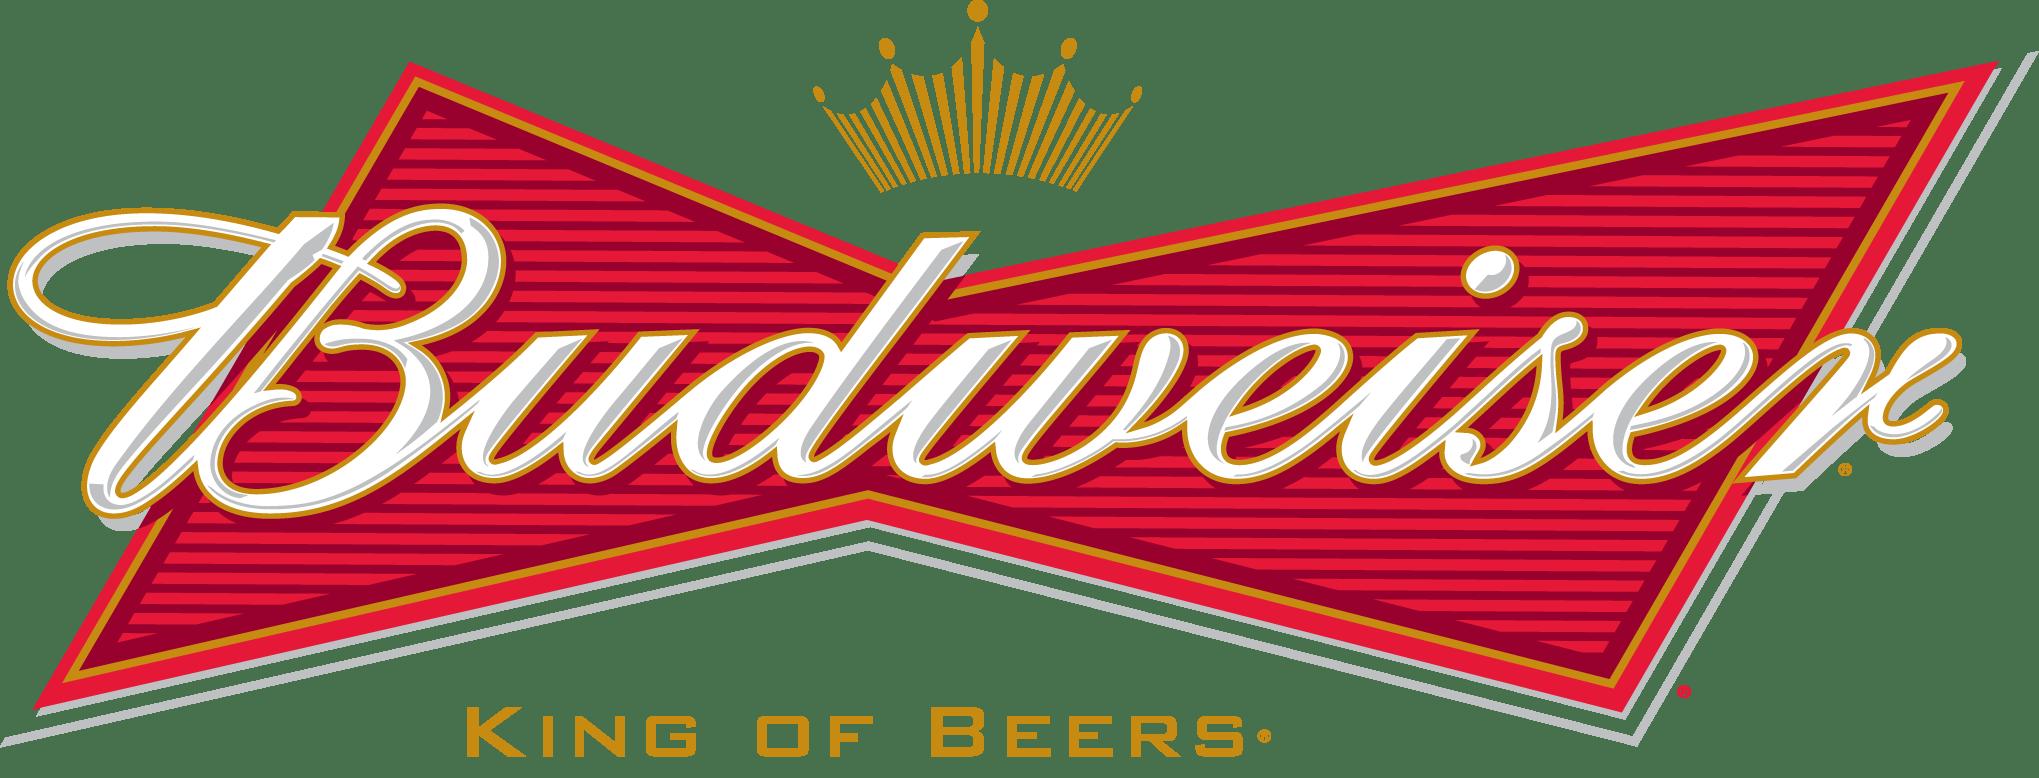 budweiser color logo rh bradentonarearegatta com budweiser logo font budweiser logo vector